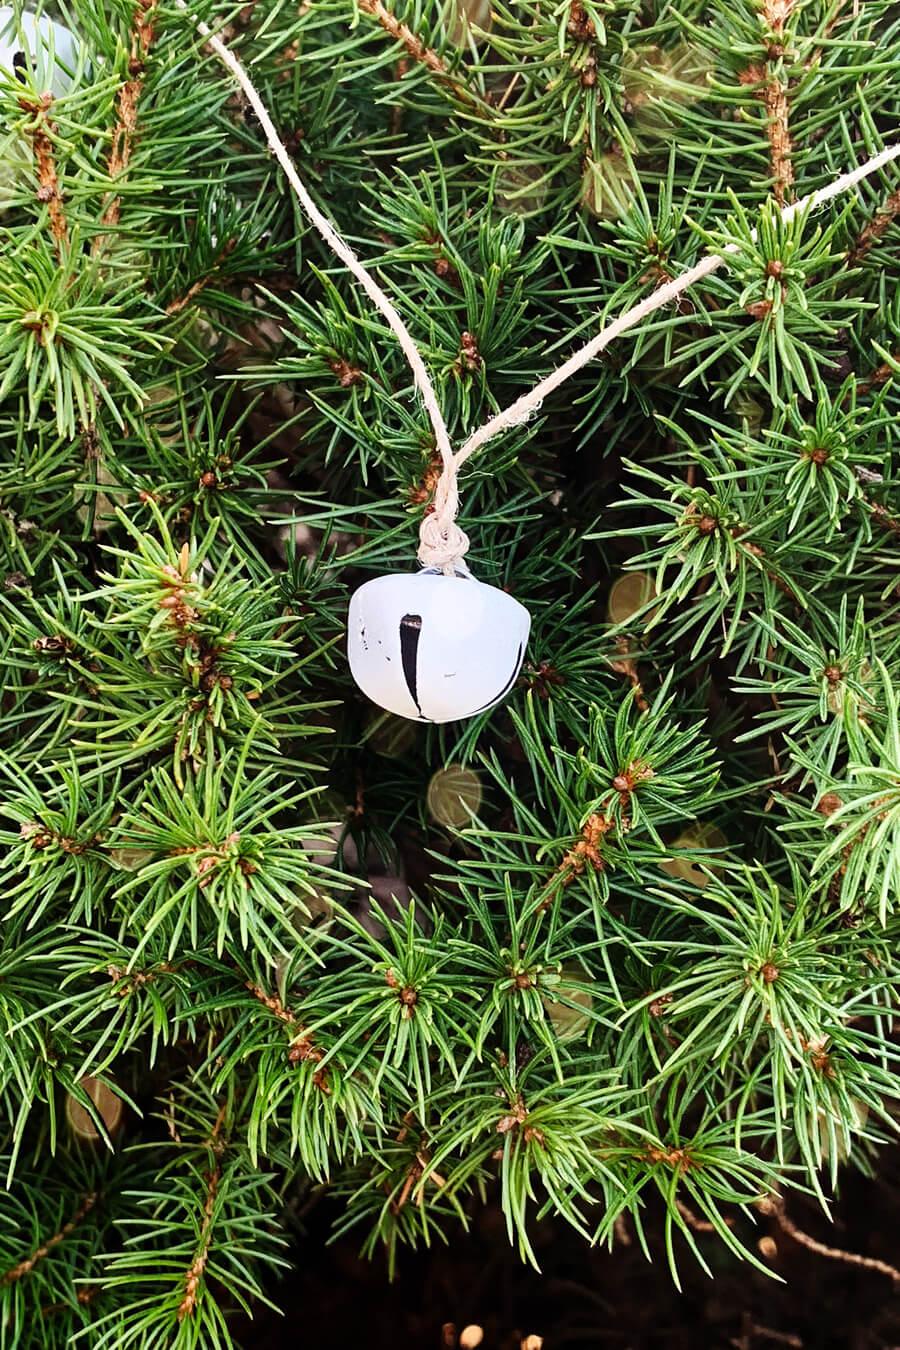 Jingle Bell Christmas Garland draped on an evergreen tree